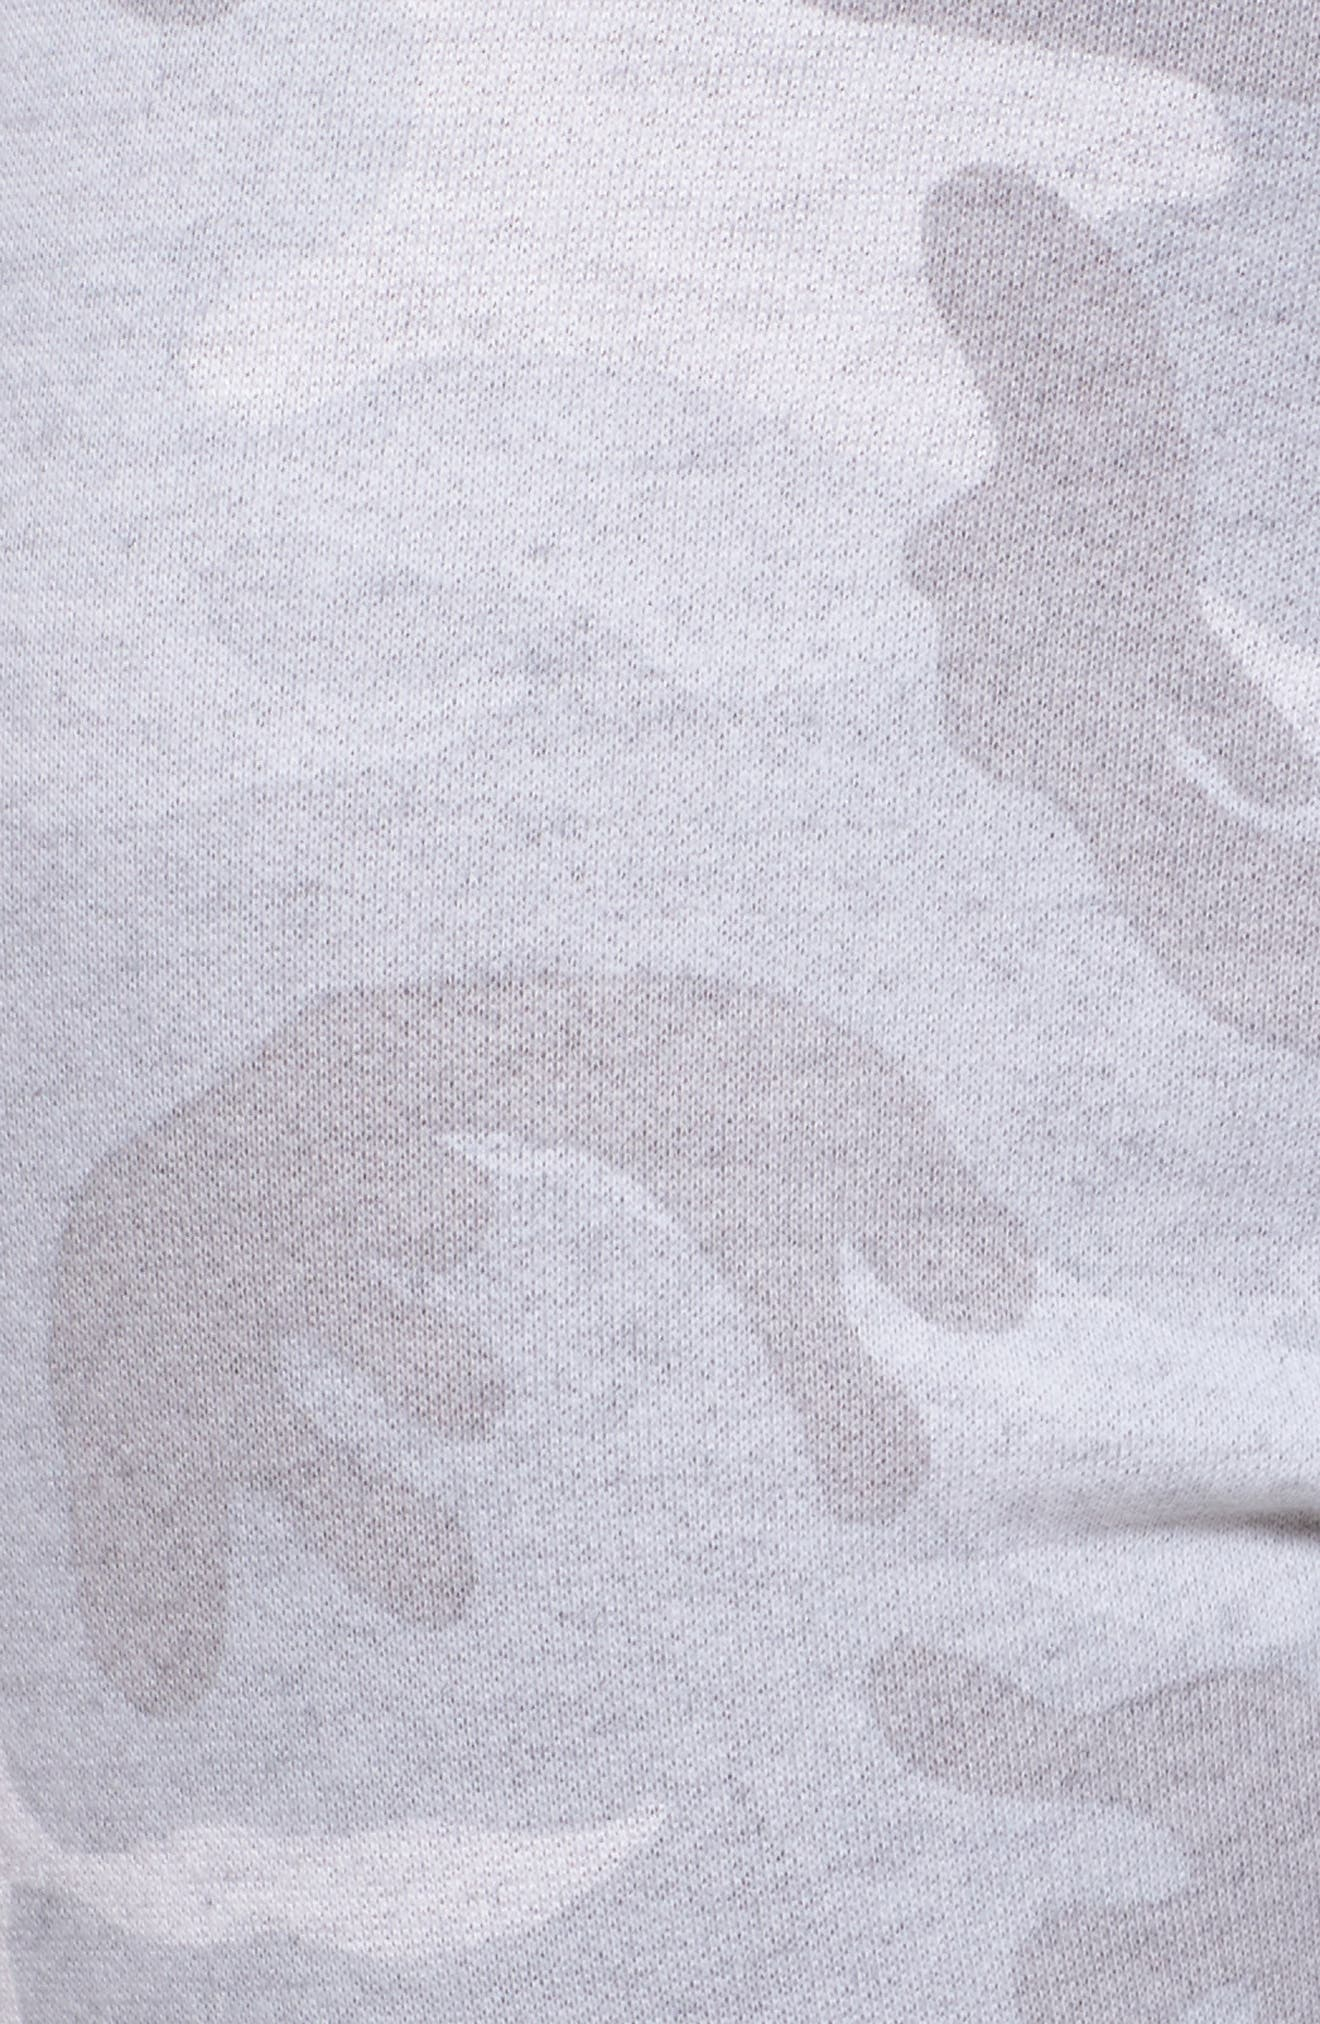 Campbell Vintage Jogger Pants,                             Alternate thumbnail 7, color,                             Light Grey Camo